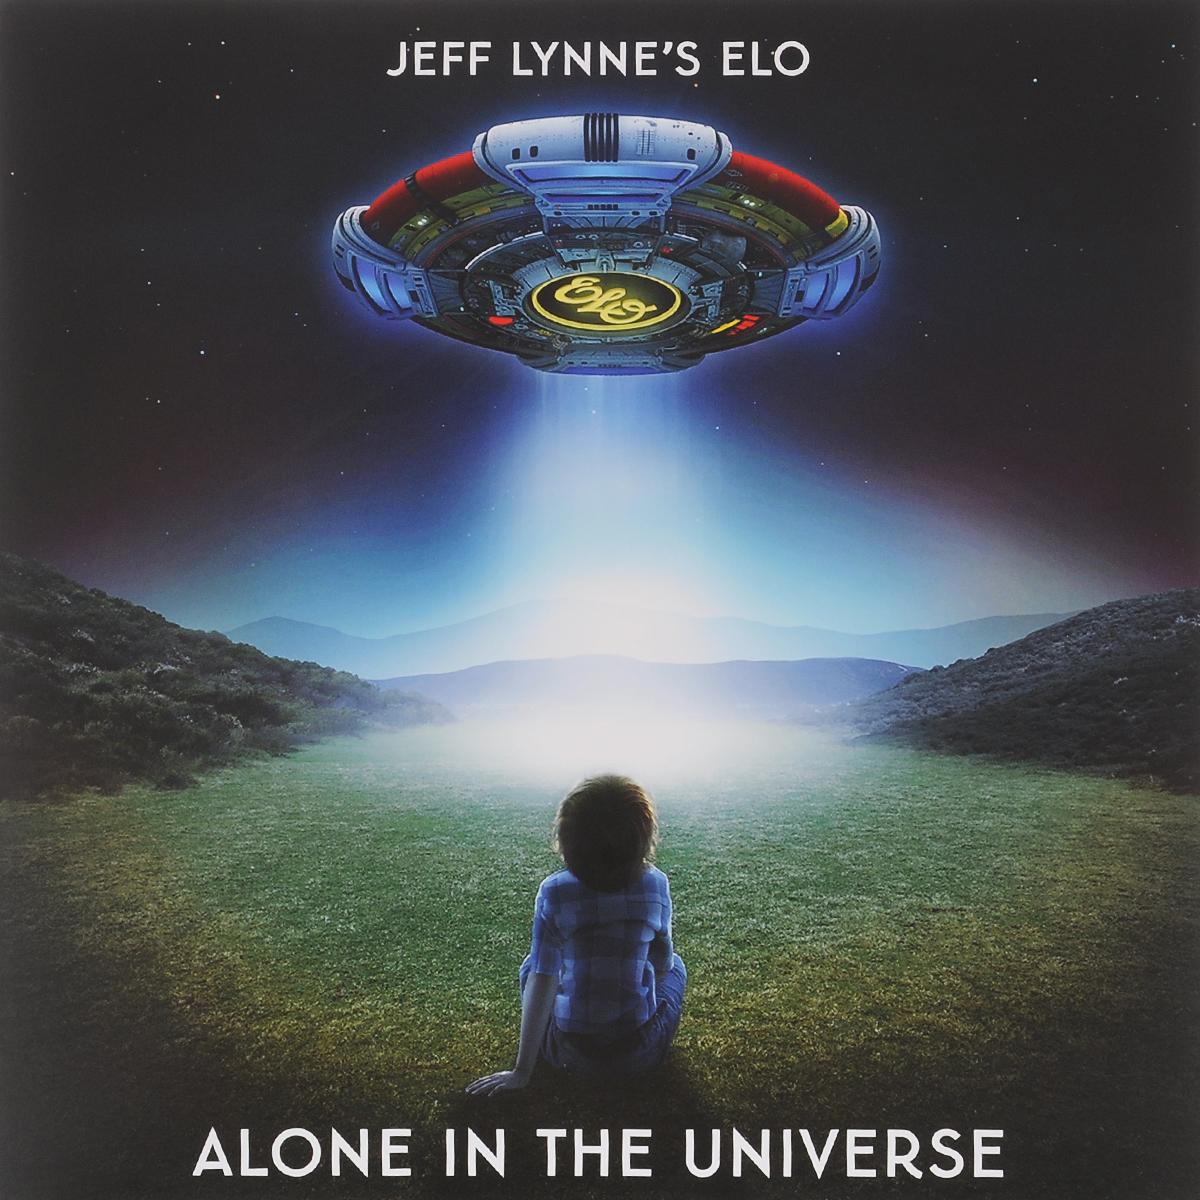 Electric Light Orchestra Jeff Lynne's Elo. Alone In The Universe (LP) electric light orchestra electric light orchestra jeff lynne s elo alone in the universe